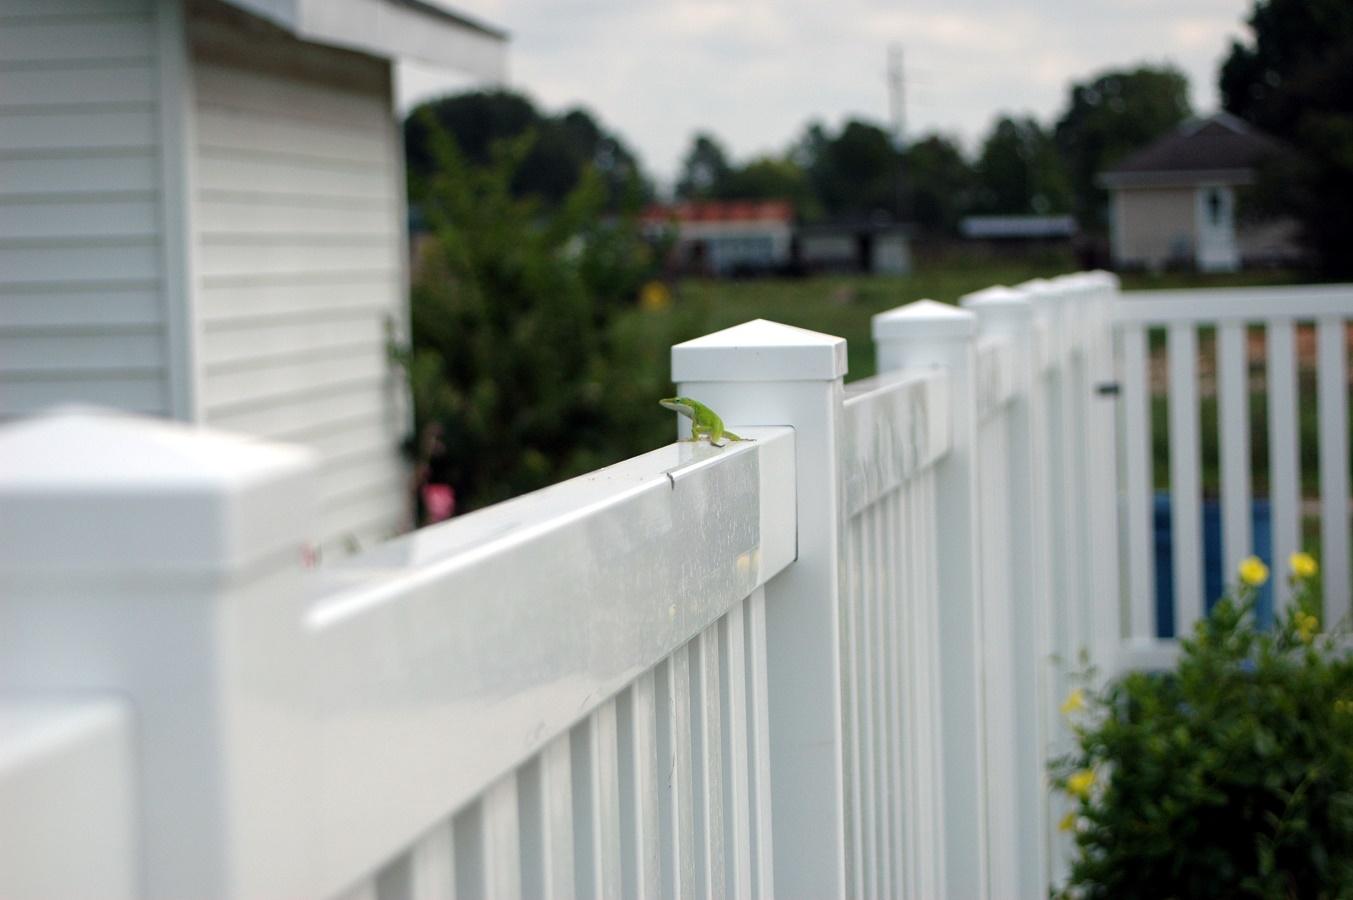 A-1 Wholesale Building Supplies & Fence image 2